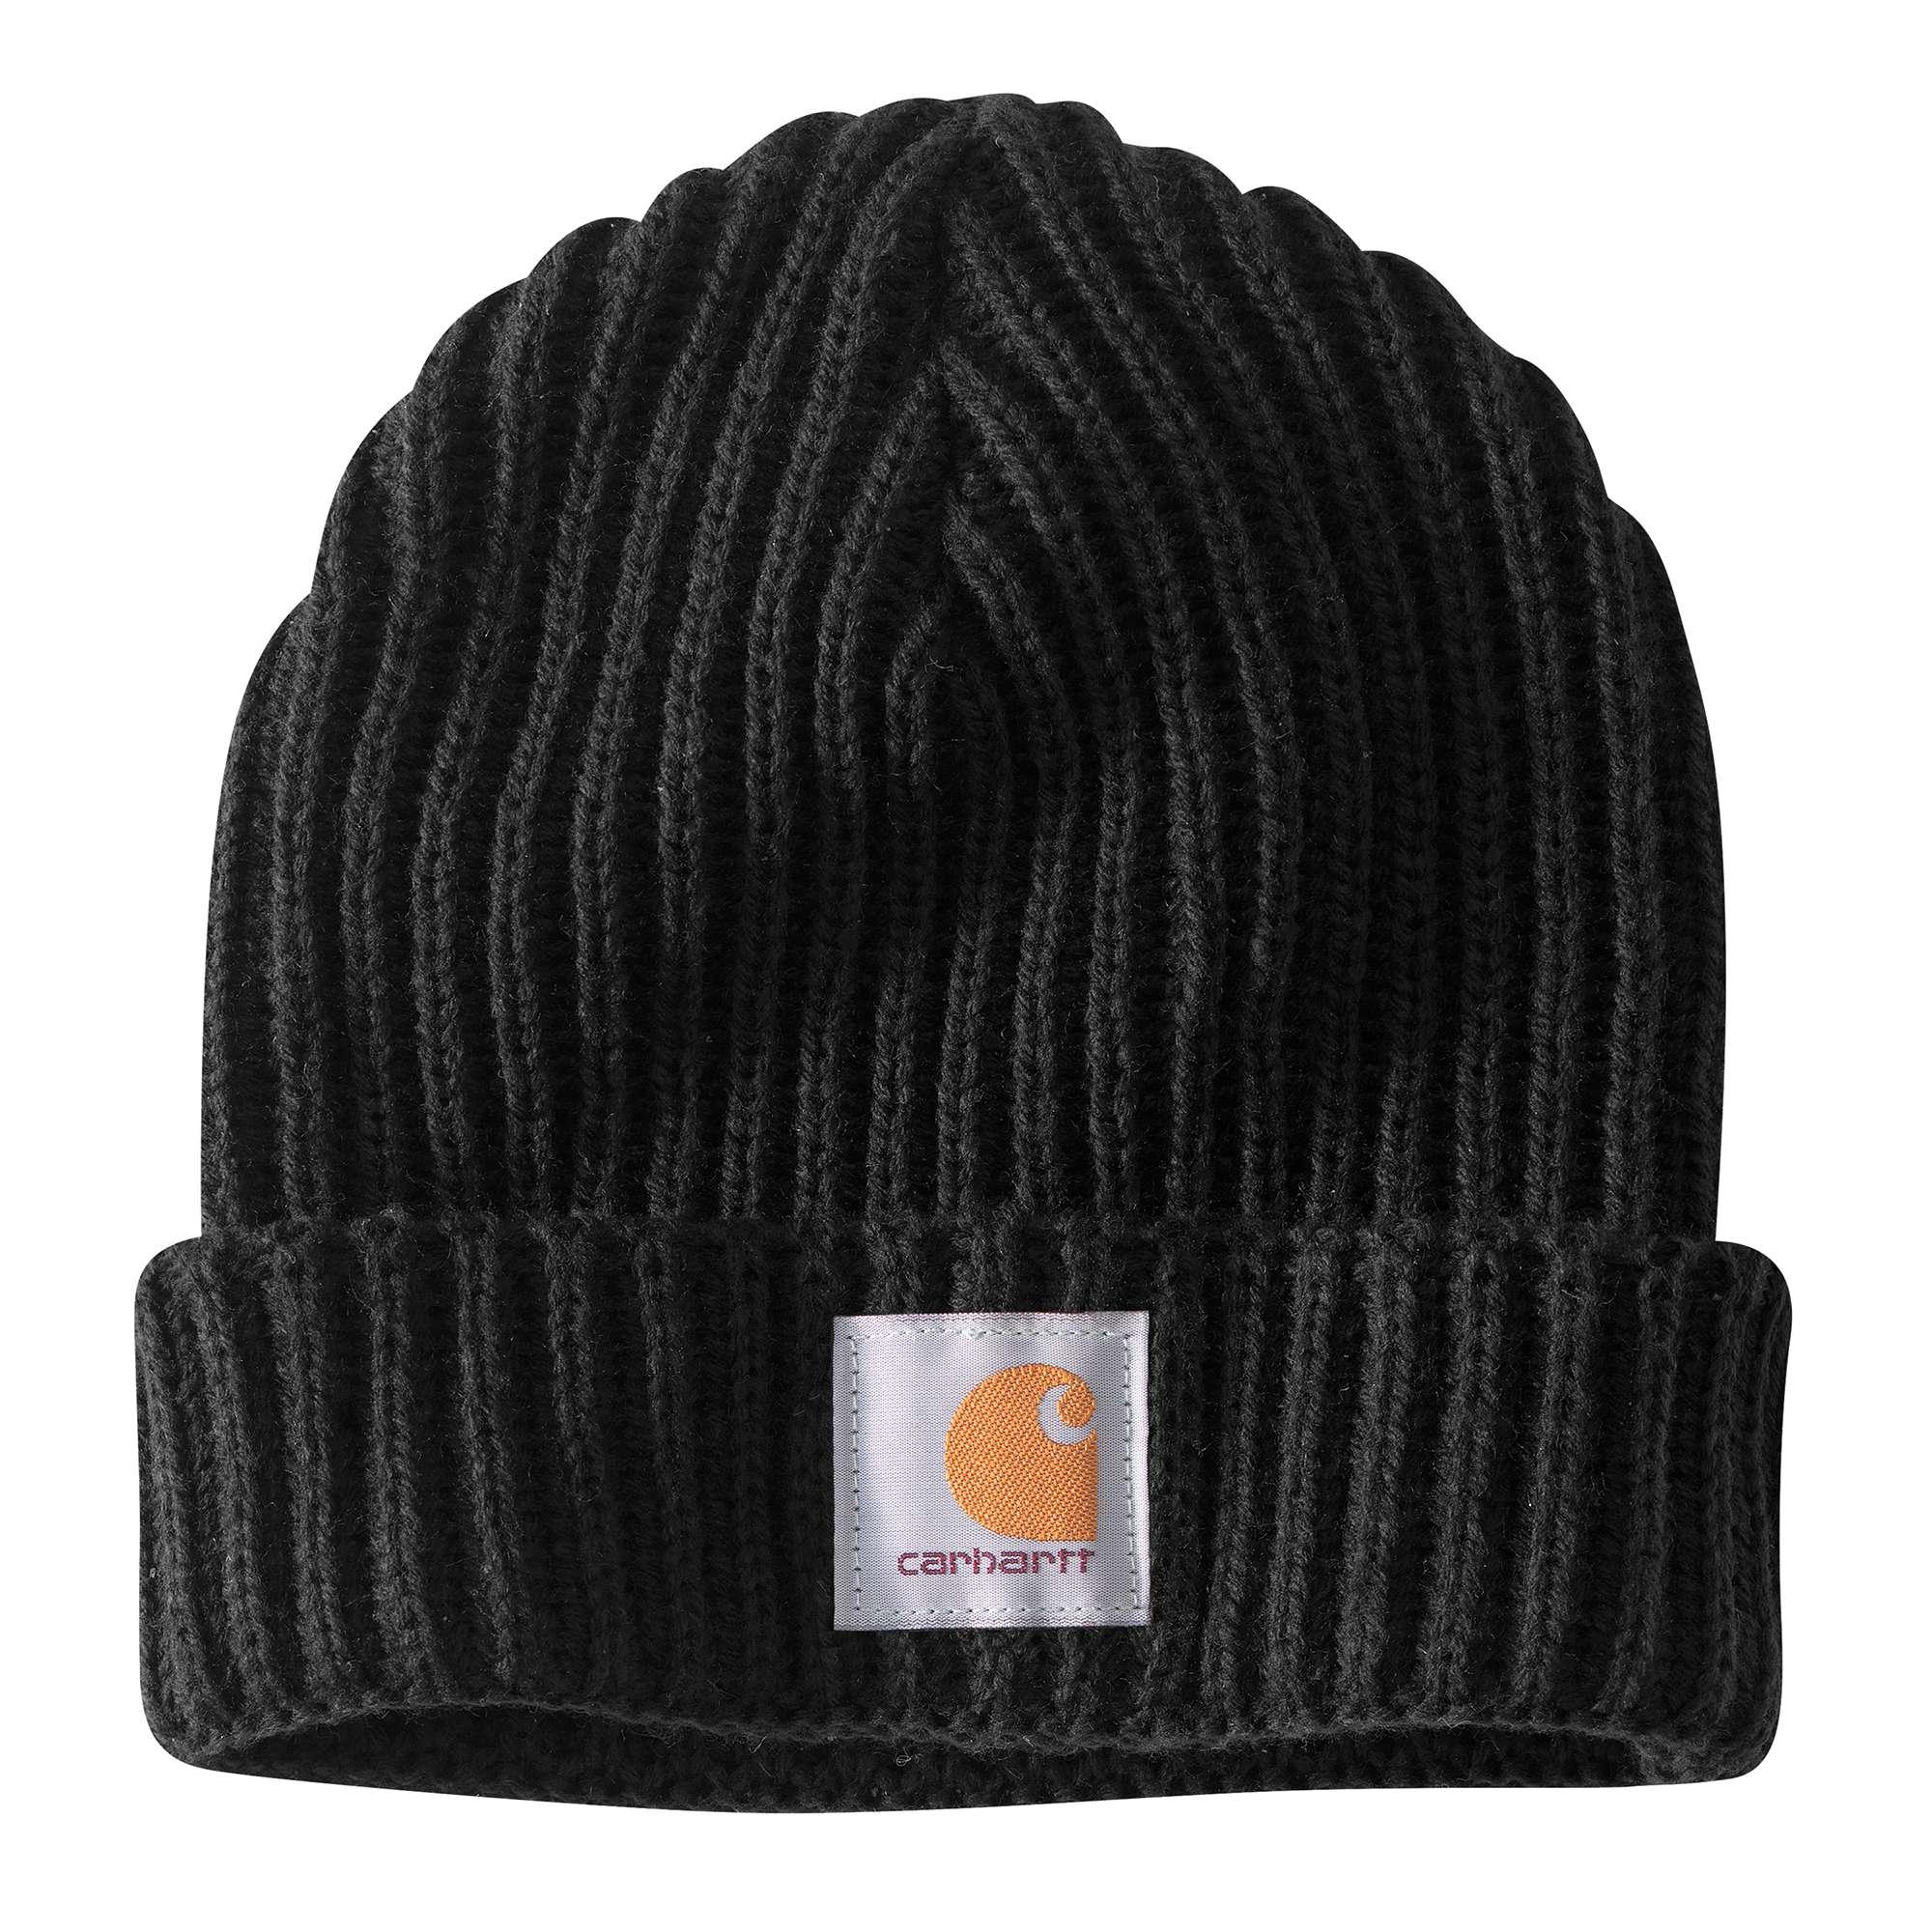 Carhartt Rib Knit Acrylic Hat